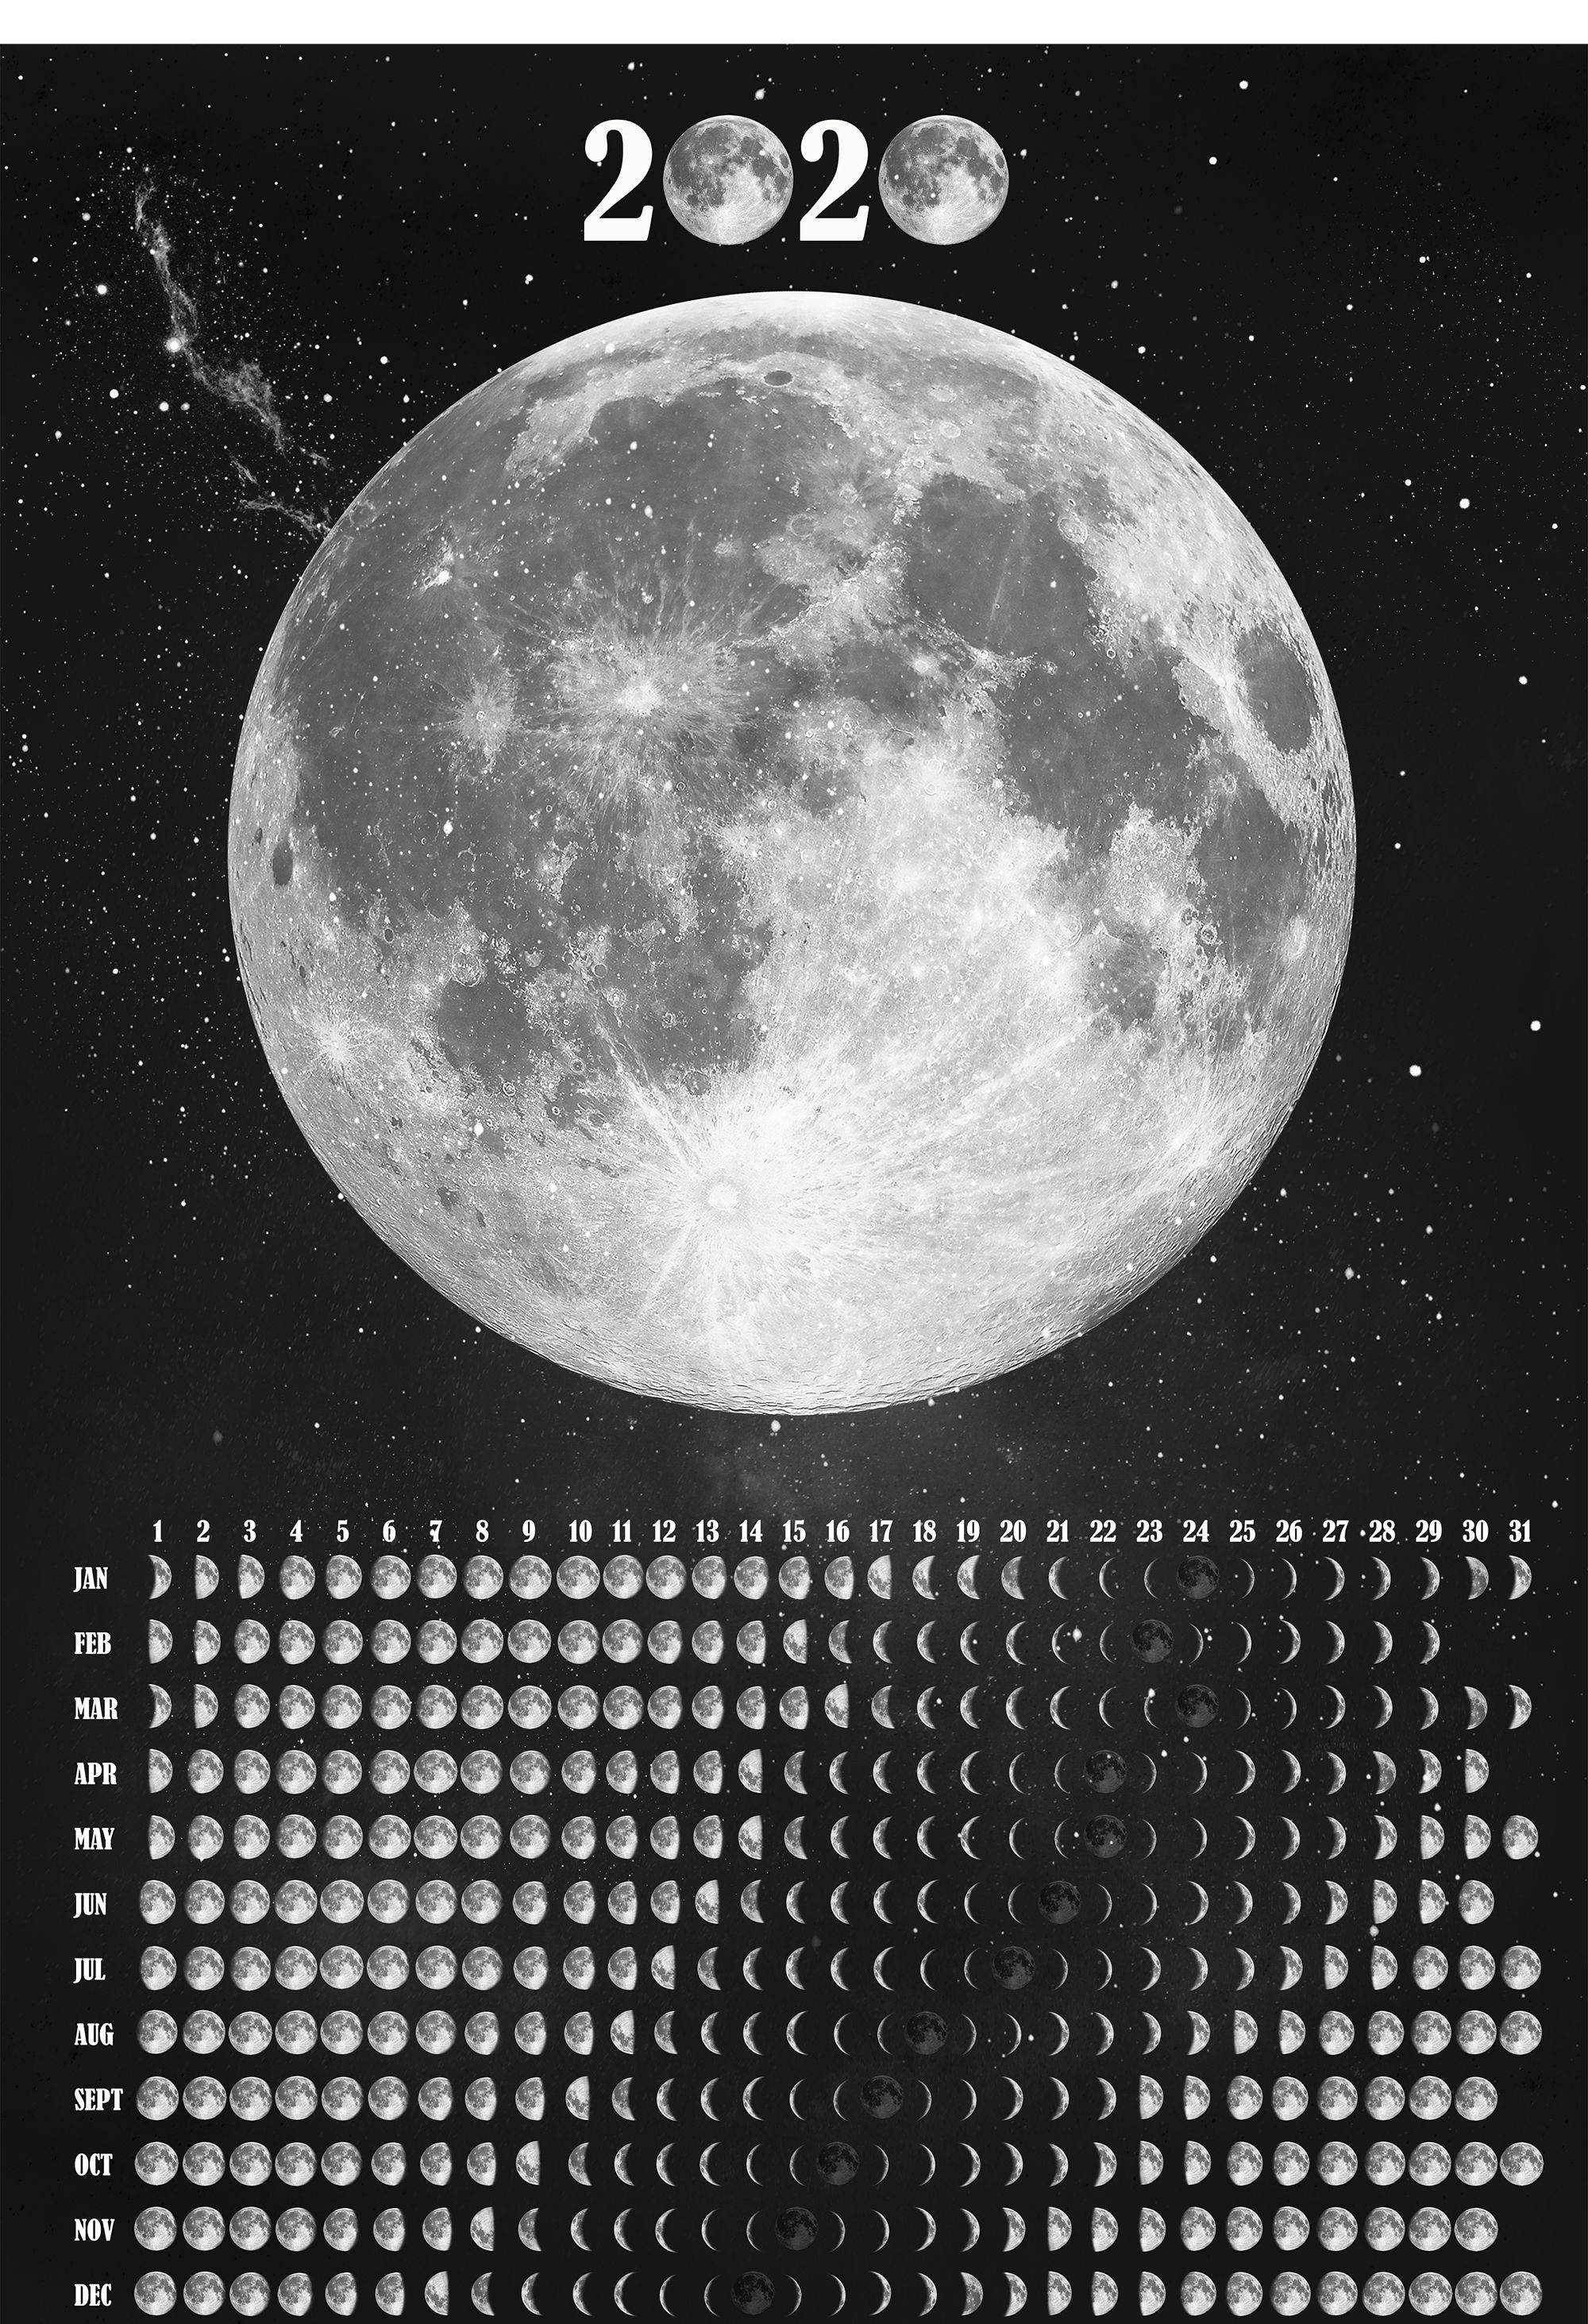 Moon Wall Calendar 2020 Lunar Calendar Moon Phase Poster Space